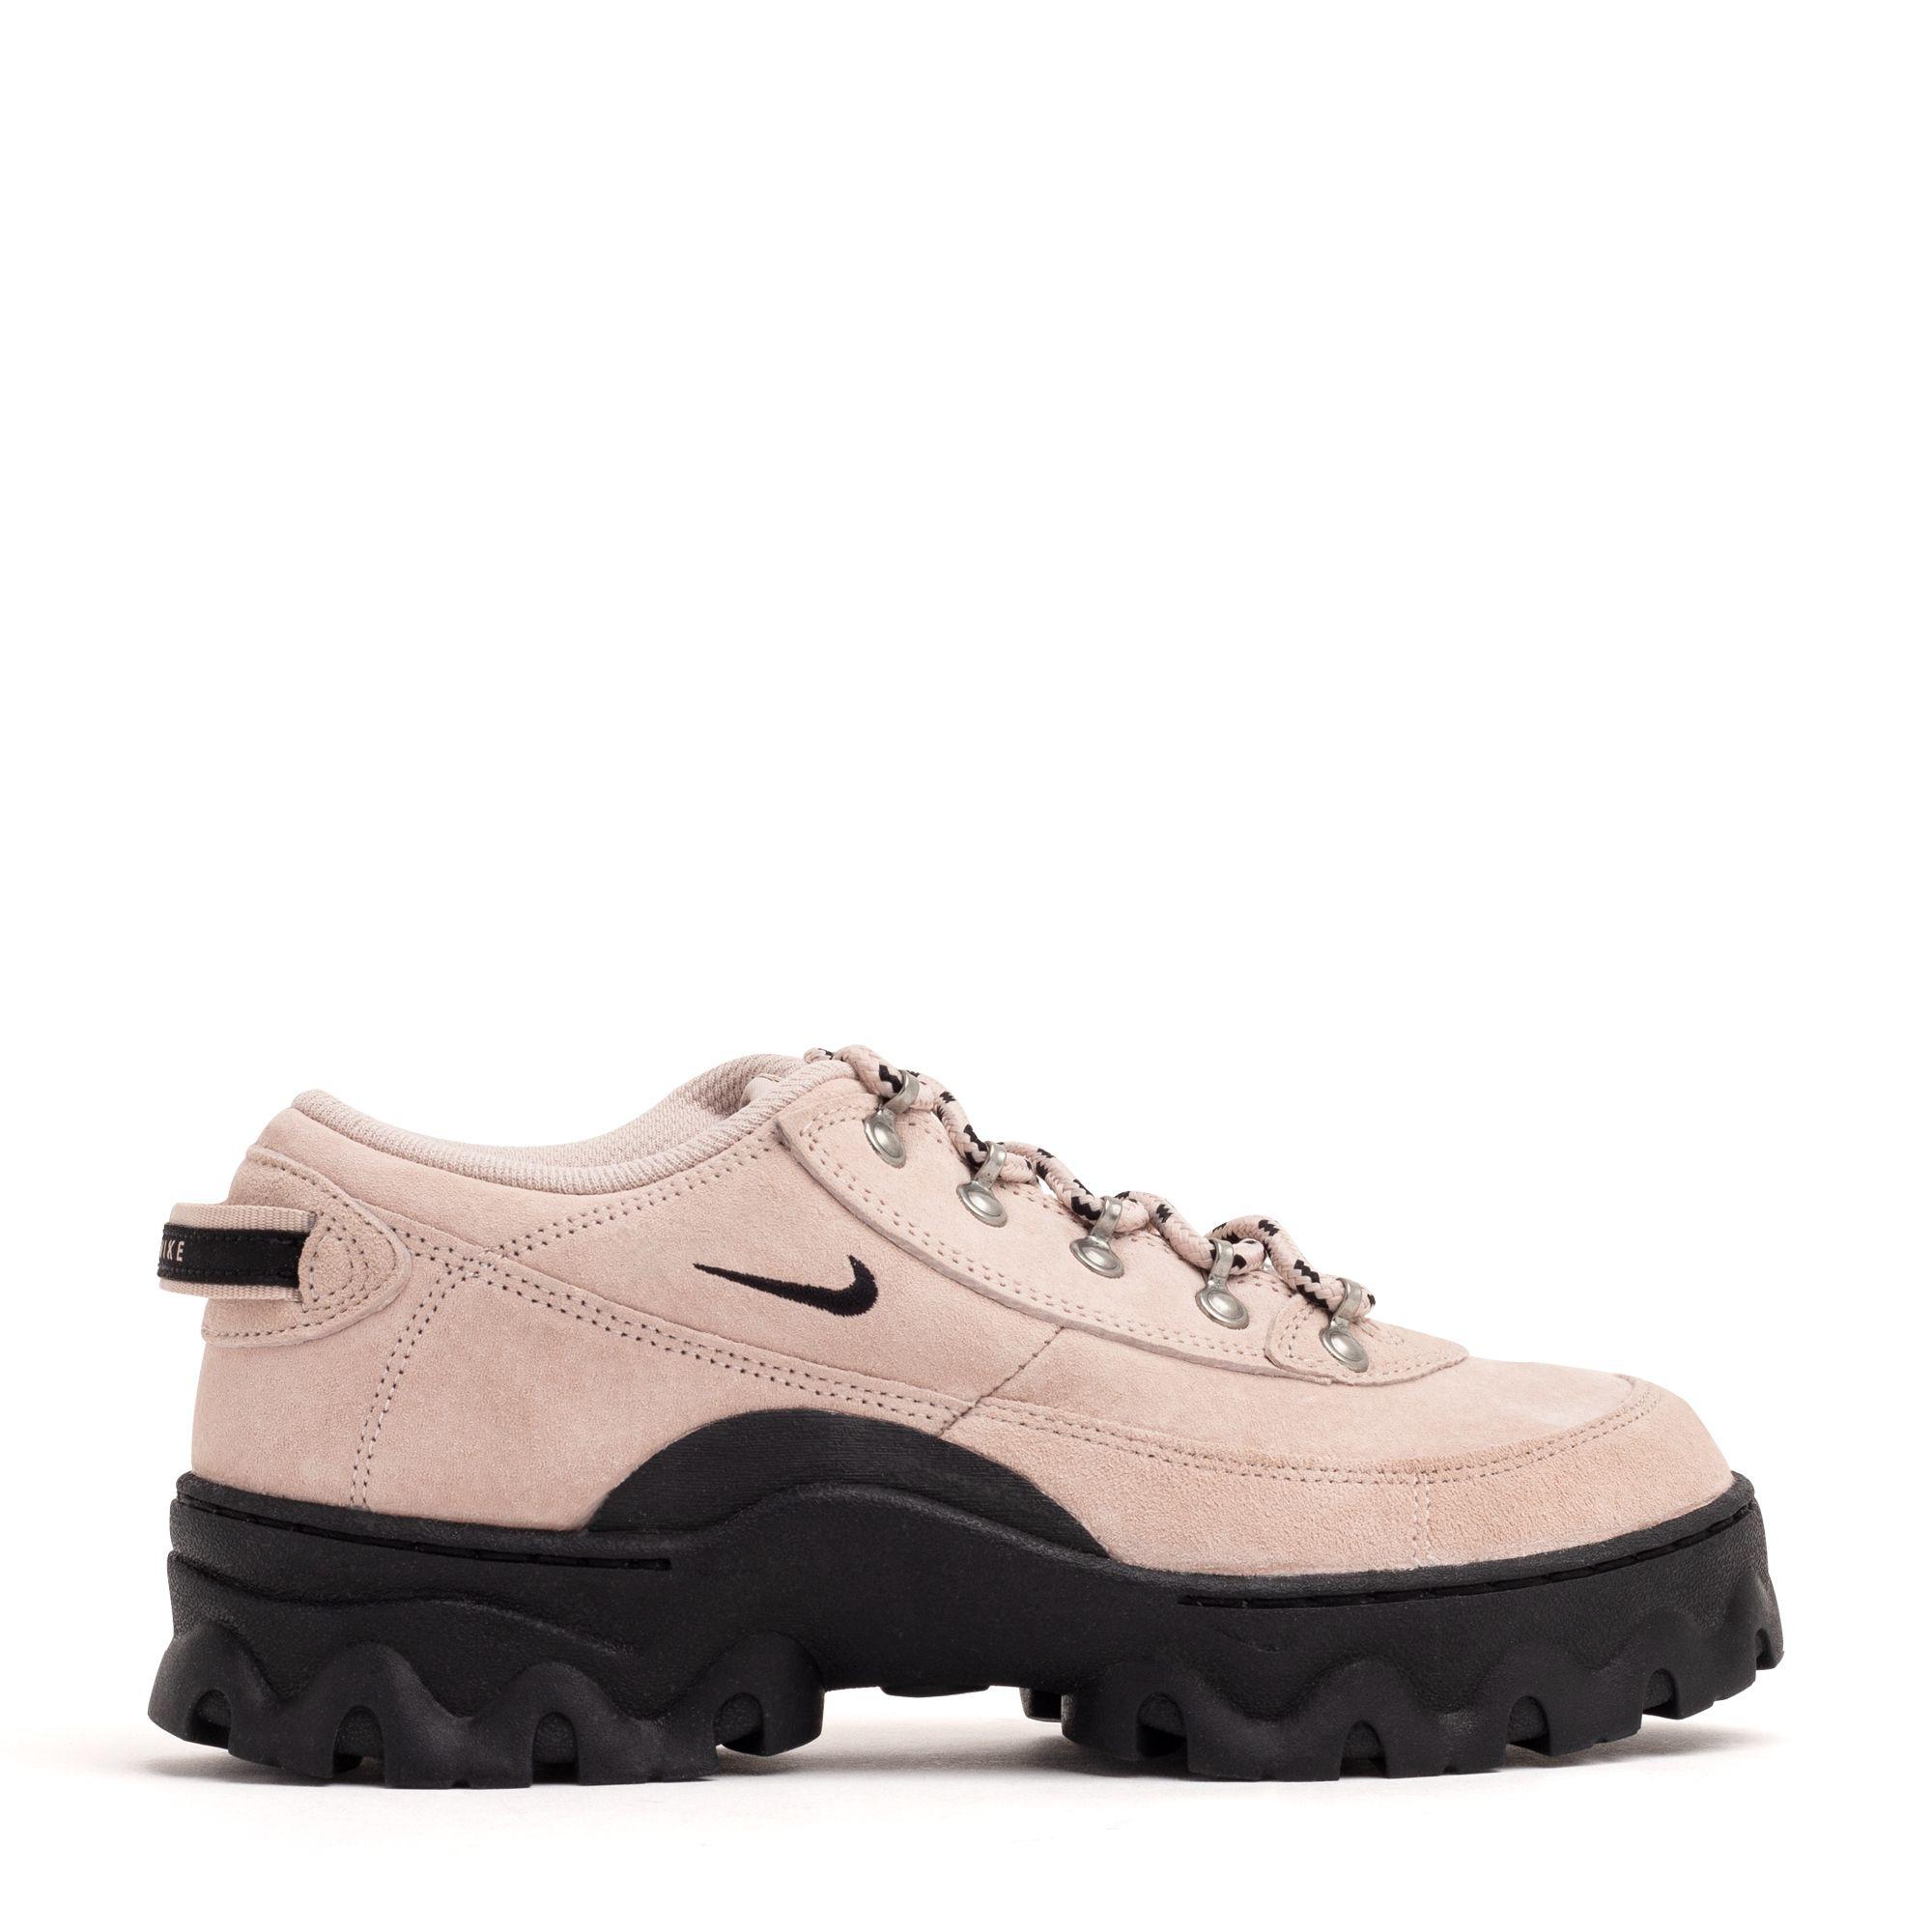 Lahar low sneakers